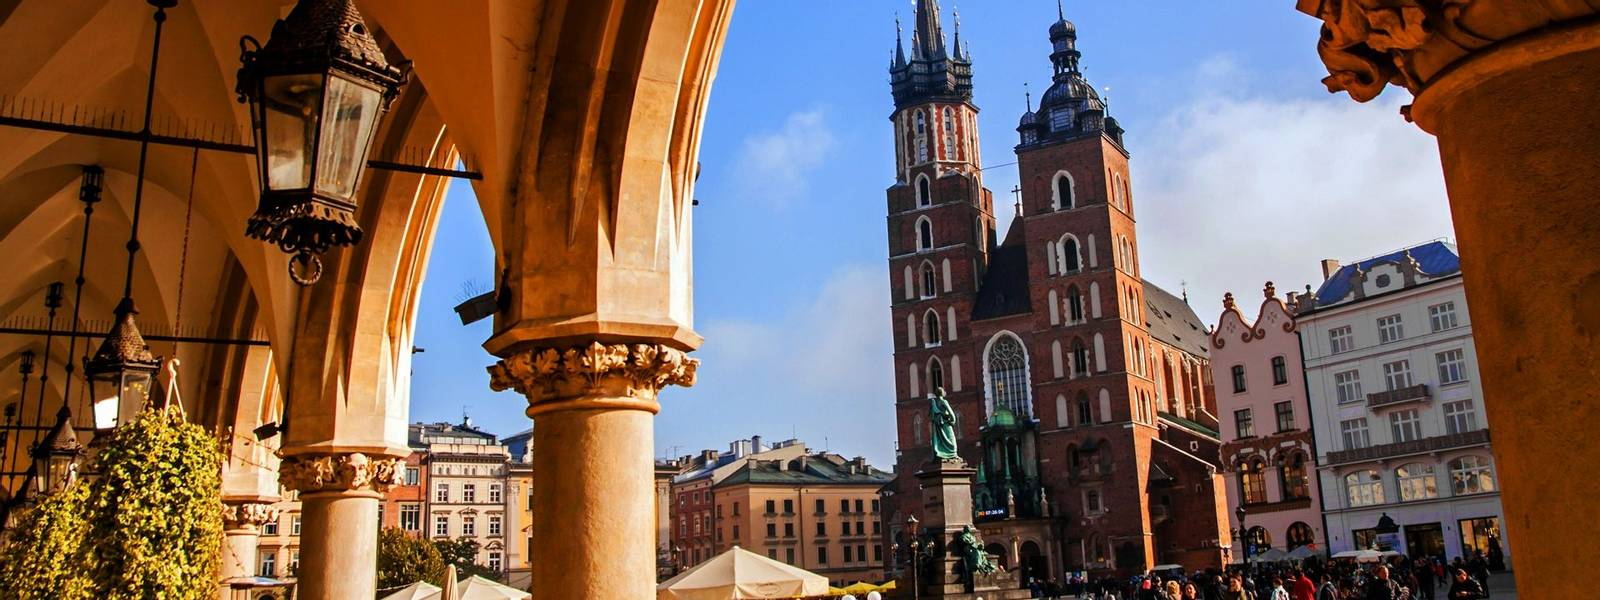 Poland-Krakow-CityBreak-AdobeStock_105200720.jpeg